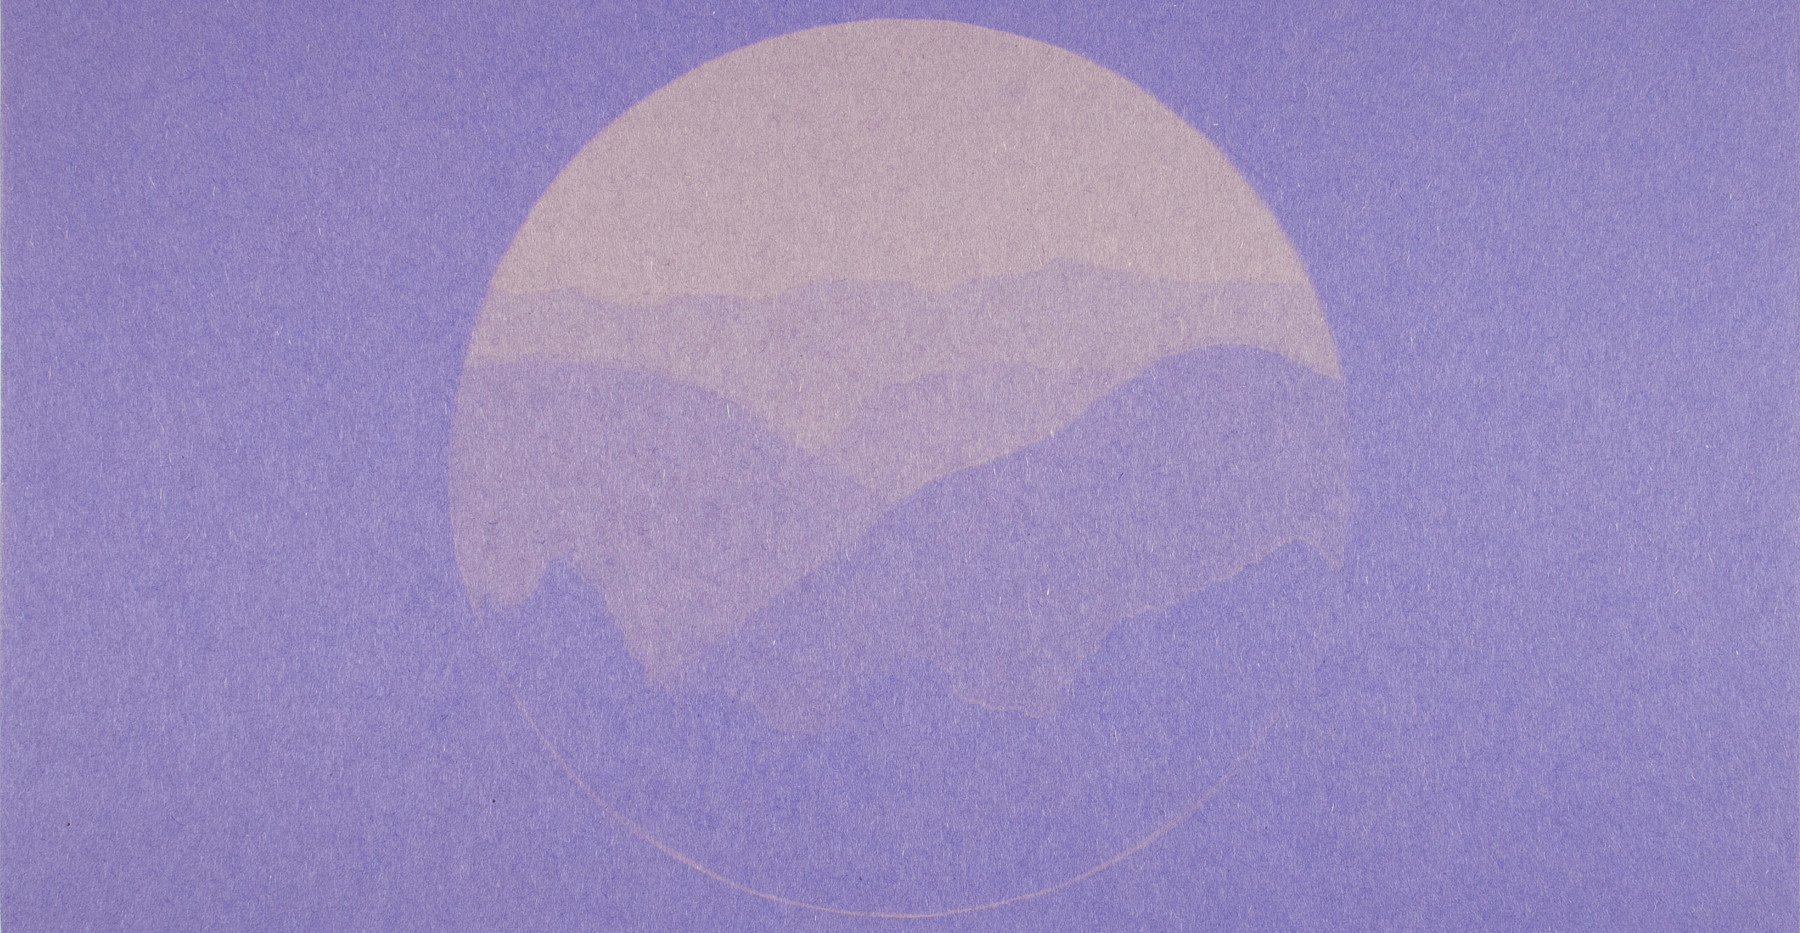 sunprint2.jpg